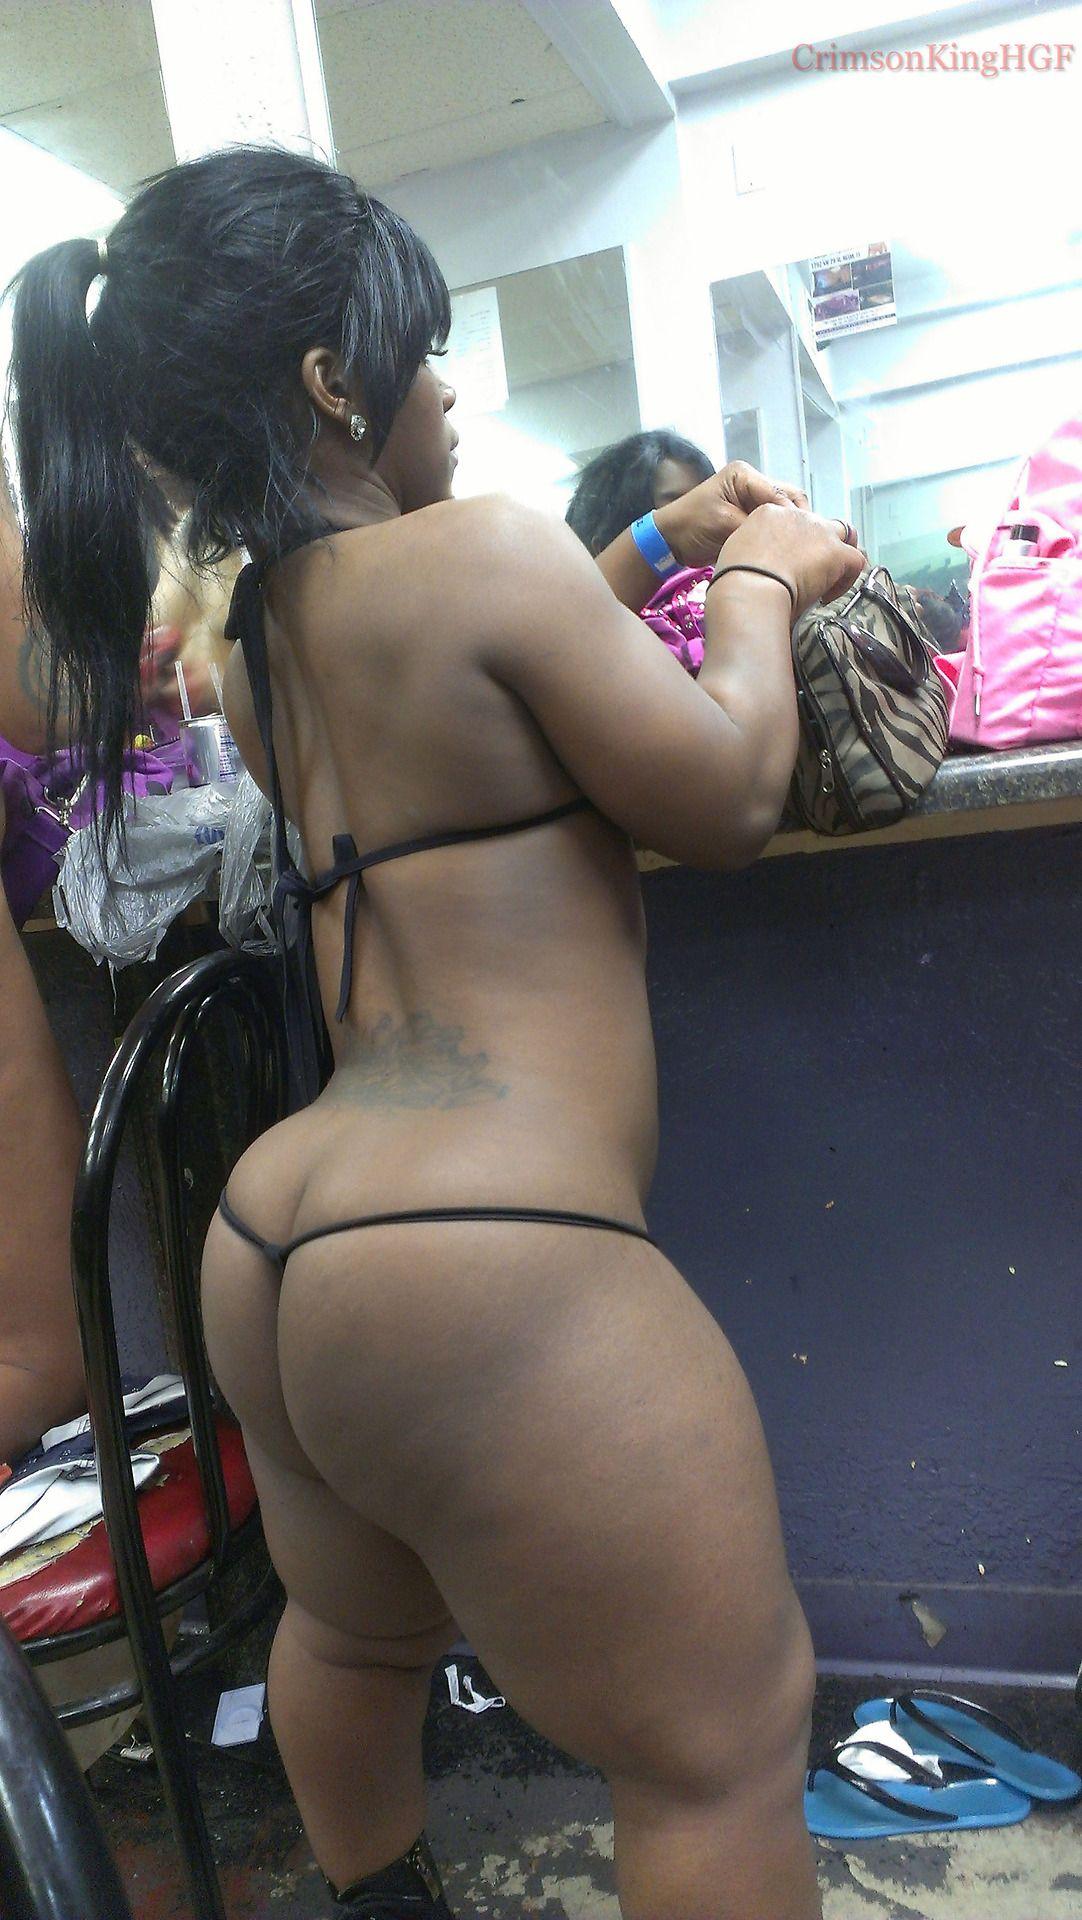 Big black booty midgets #5